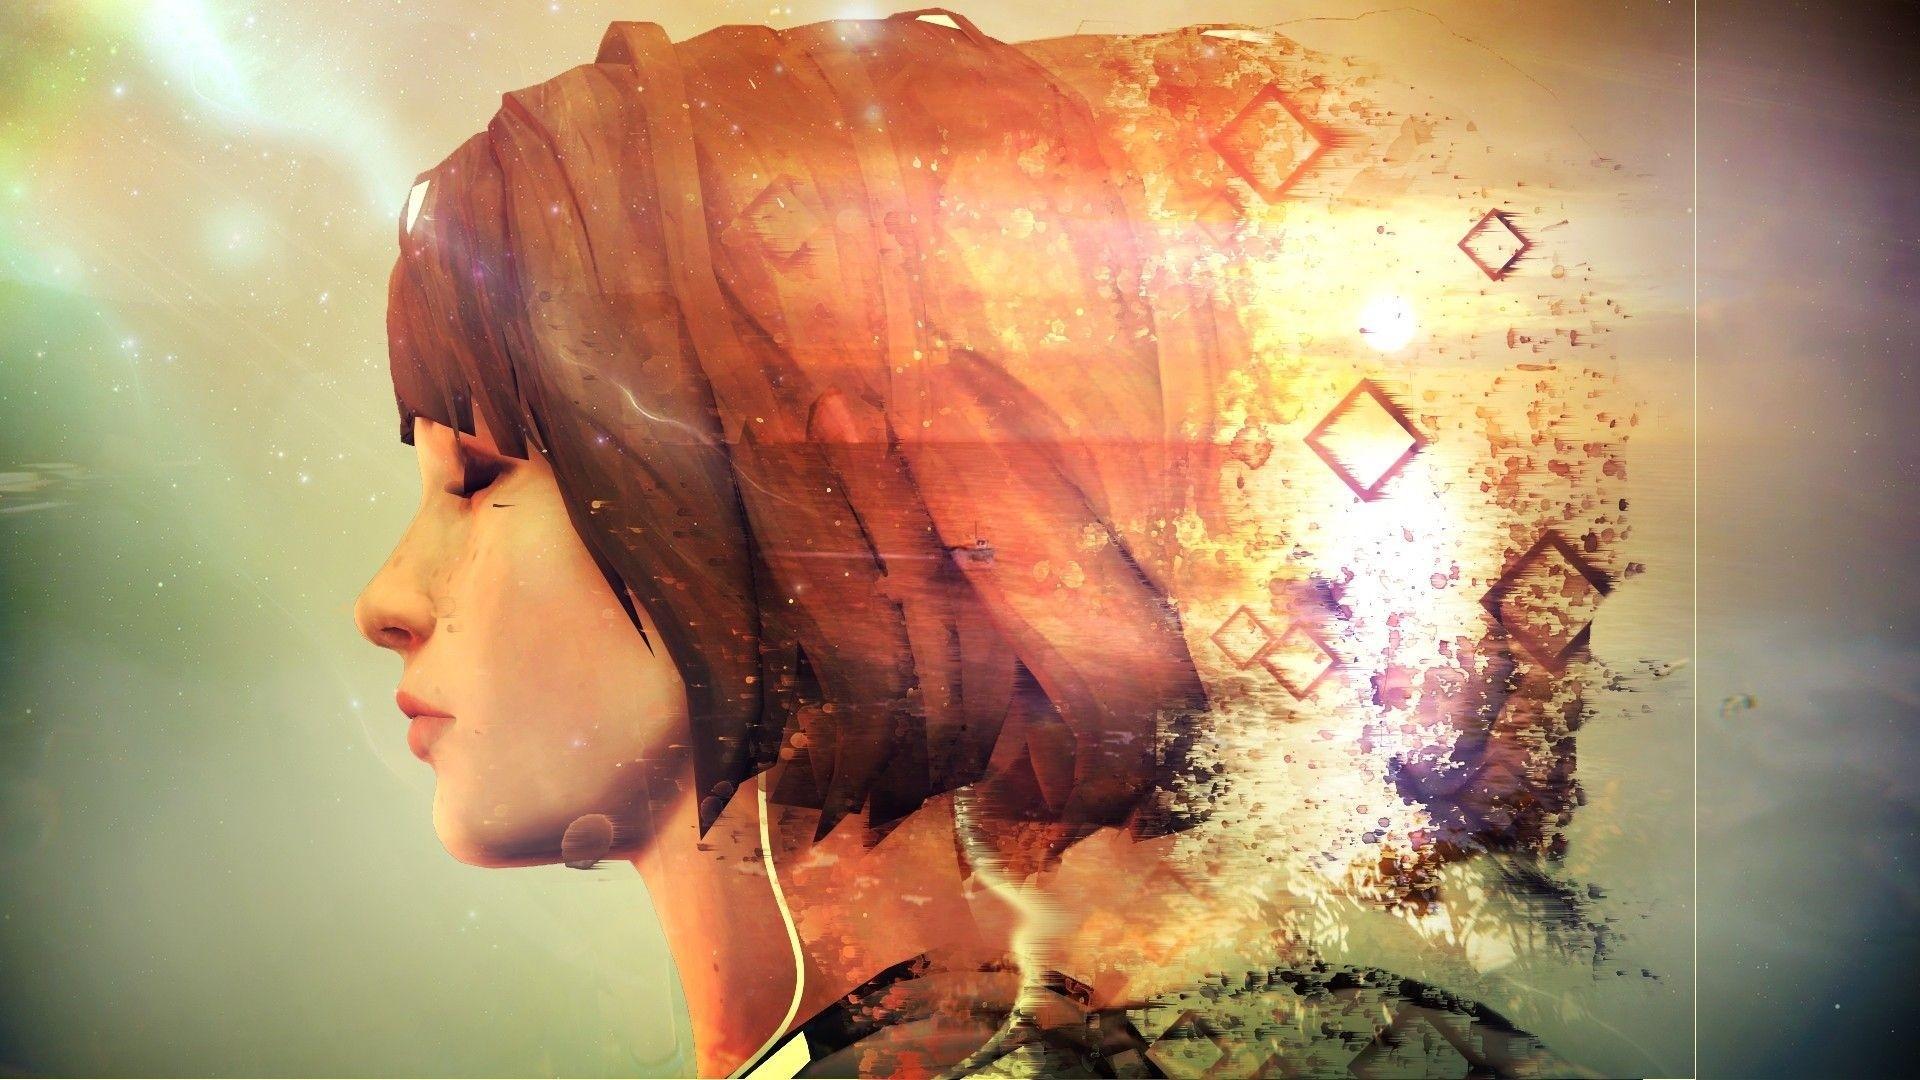 Life Is Strange Wallpaper image hd